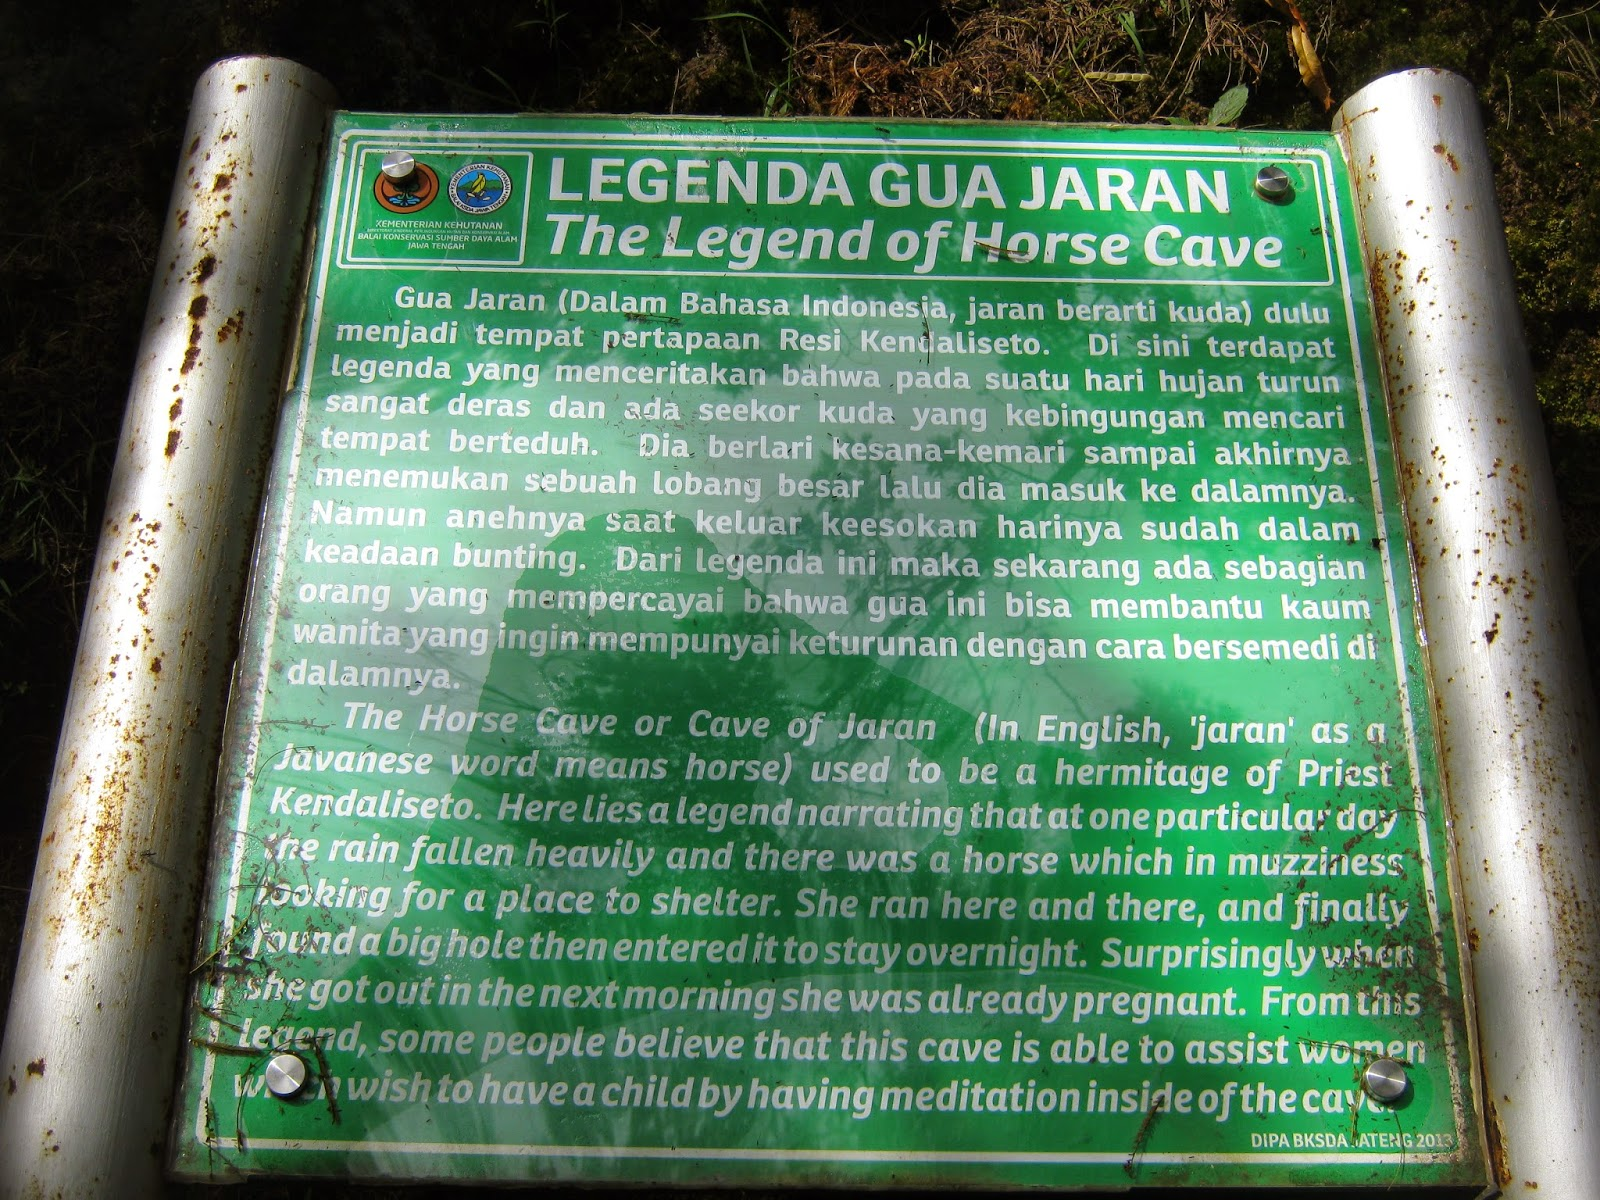 Legenda dan sejarah goa jaran